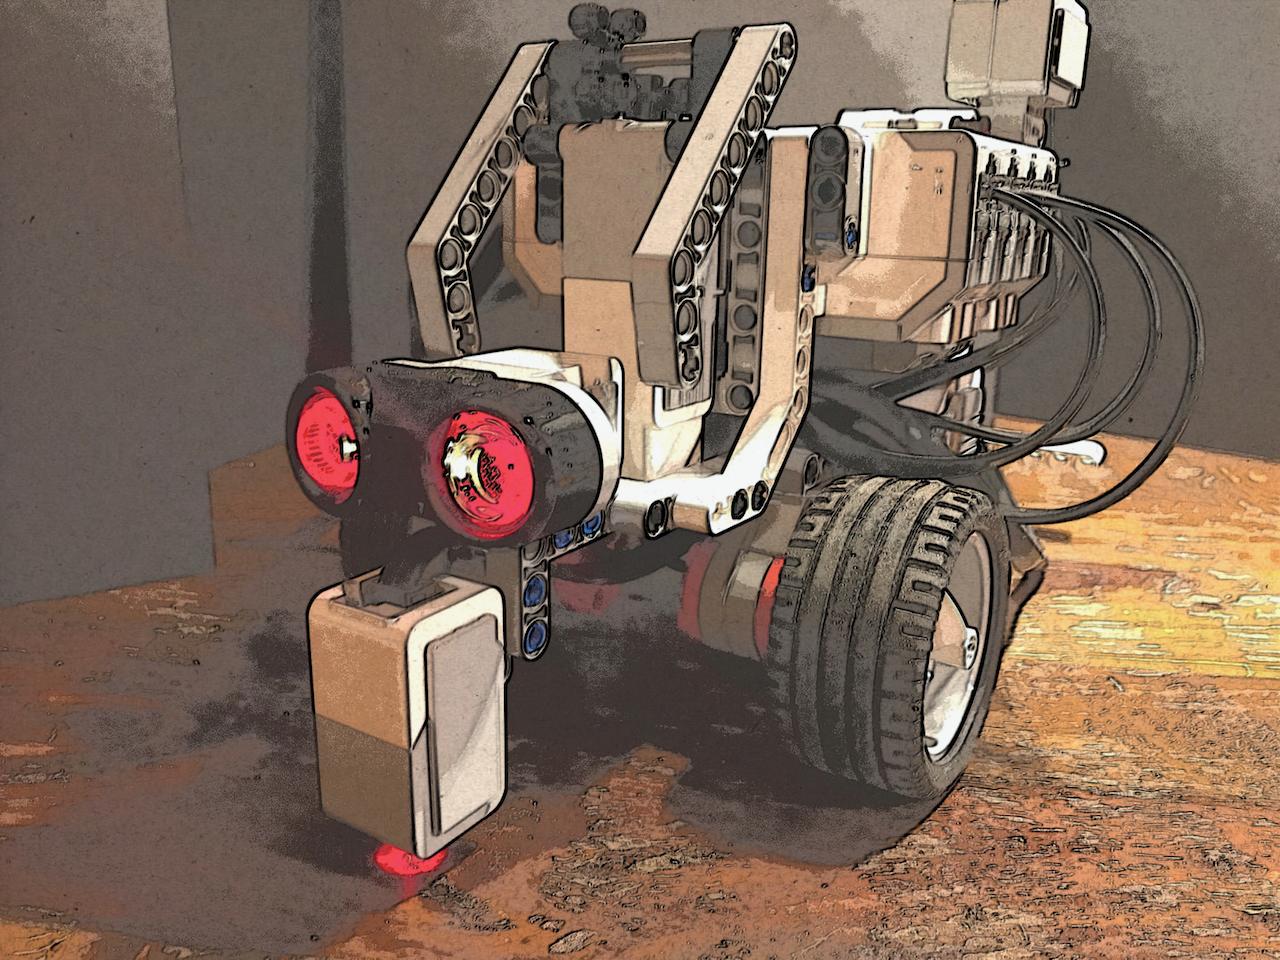 fitzgerald-robot-team-ev3